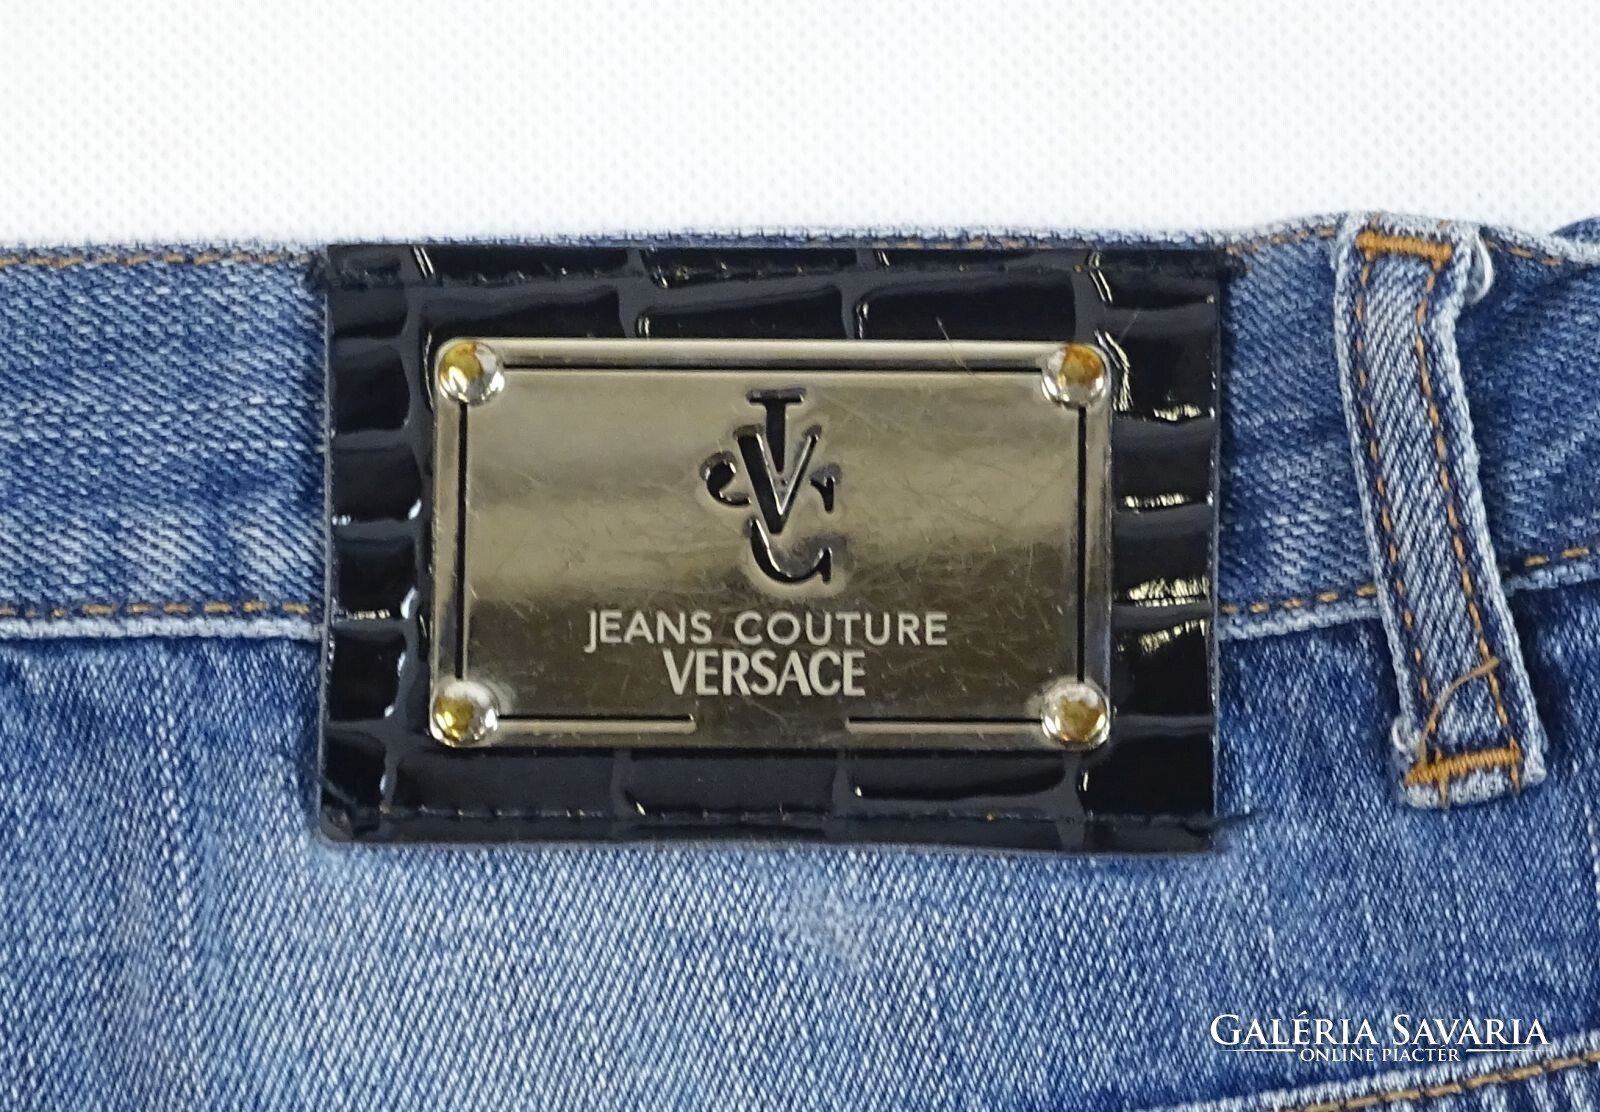 0V707 Versace fehér farmer nadrág 31 Gardrób | Galéria